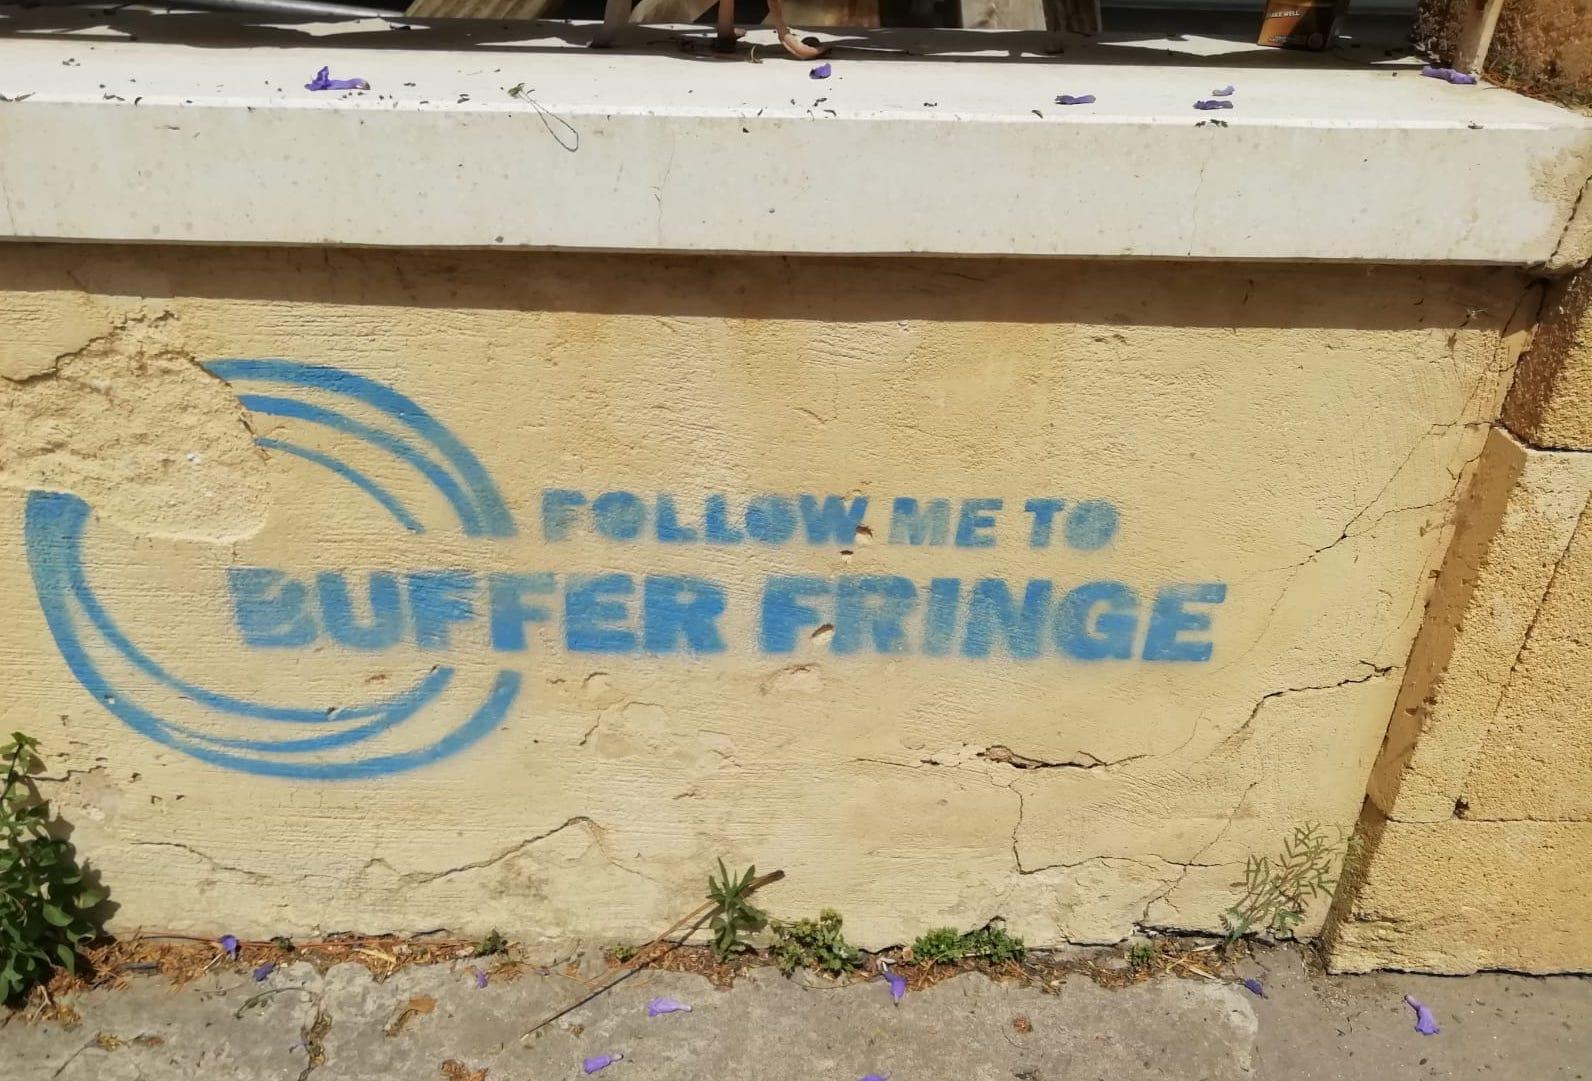 "Graffiti seen on wall in Nicosia in blue lettering reads ""Follow Me to Buffer Fringe"""